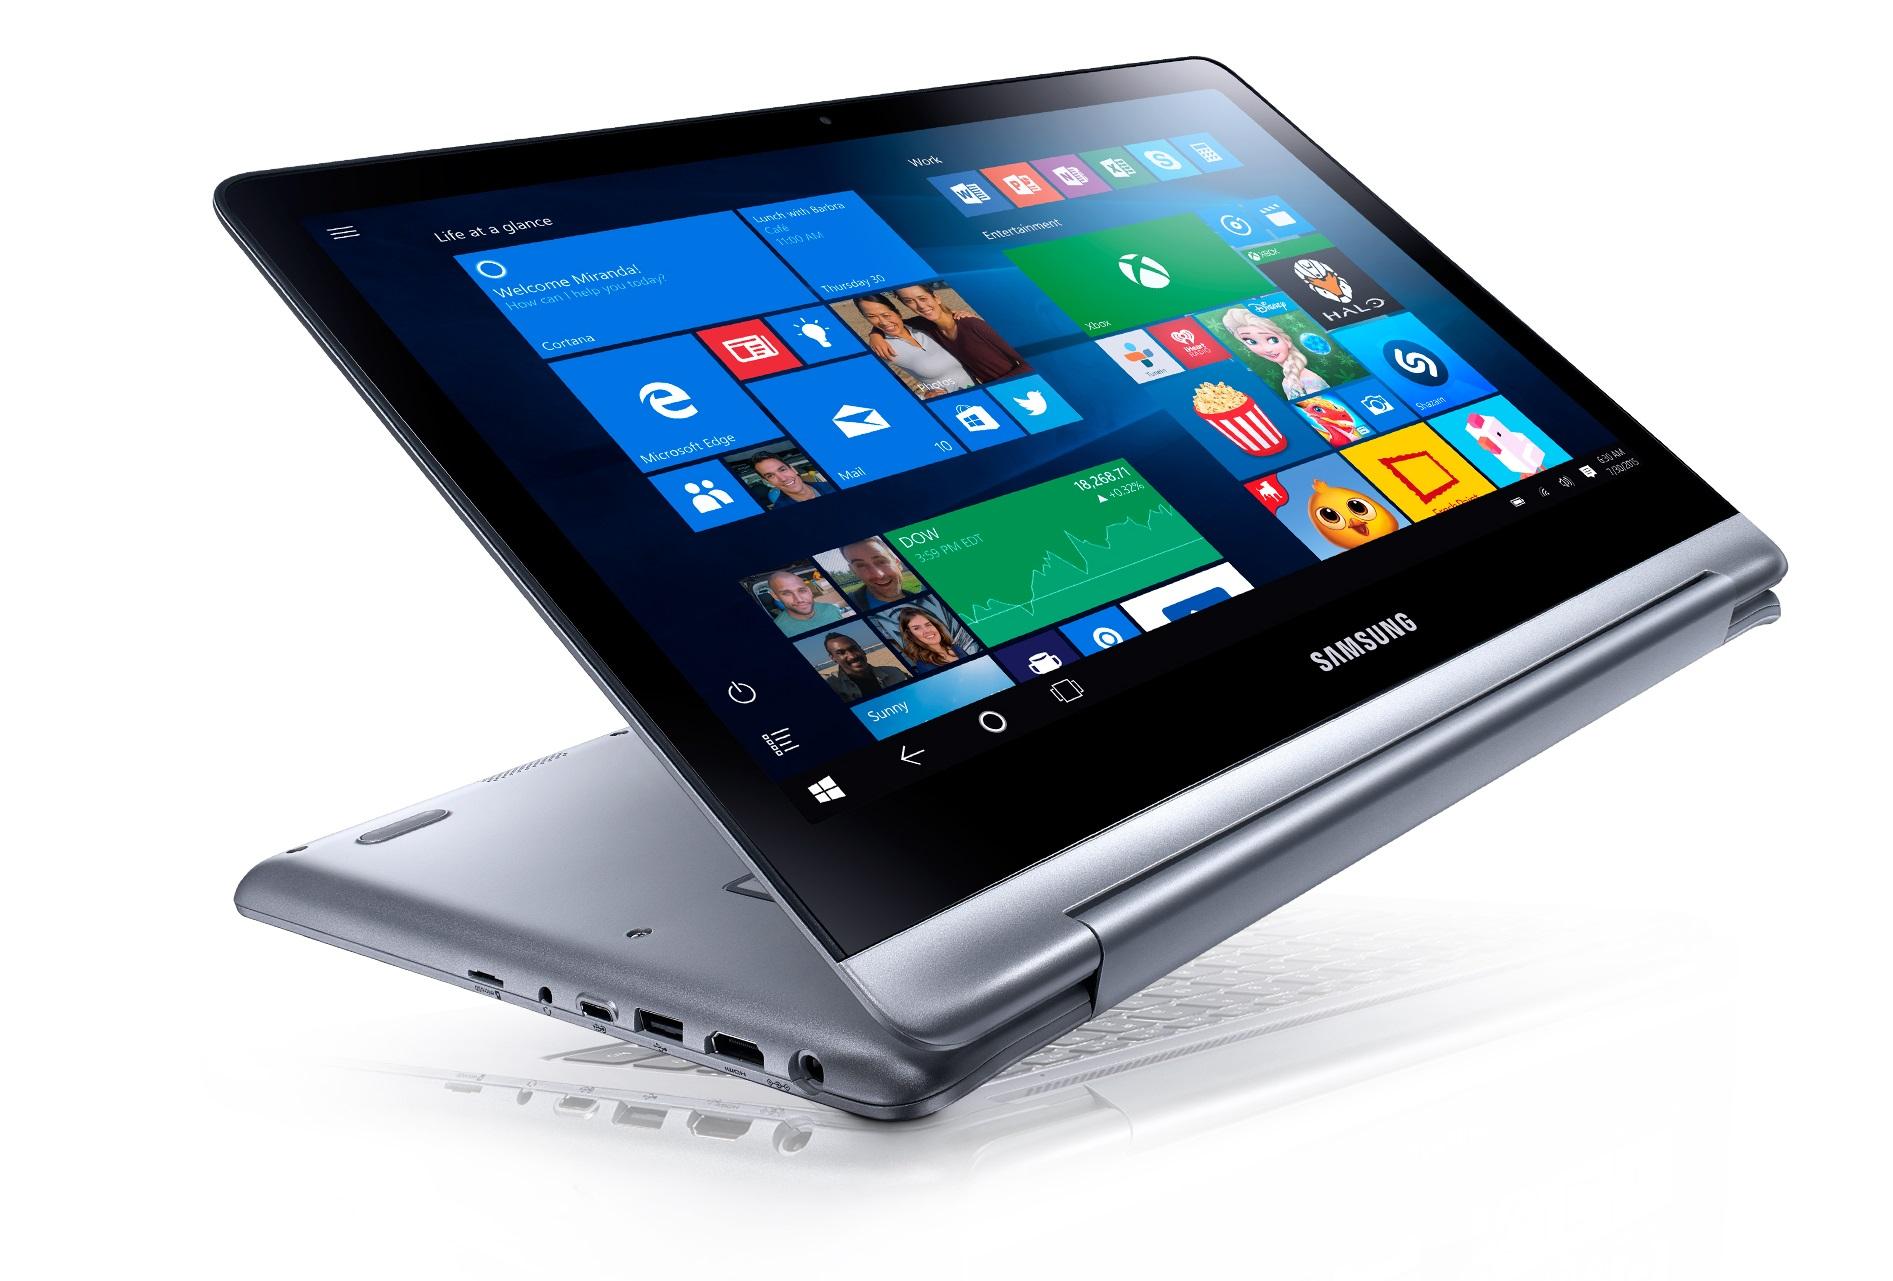 samsung-notebook-7-spin-convertible-laptop